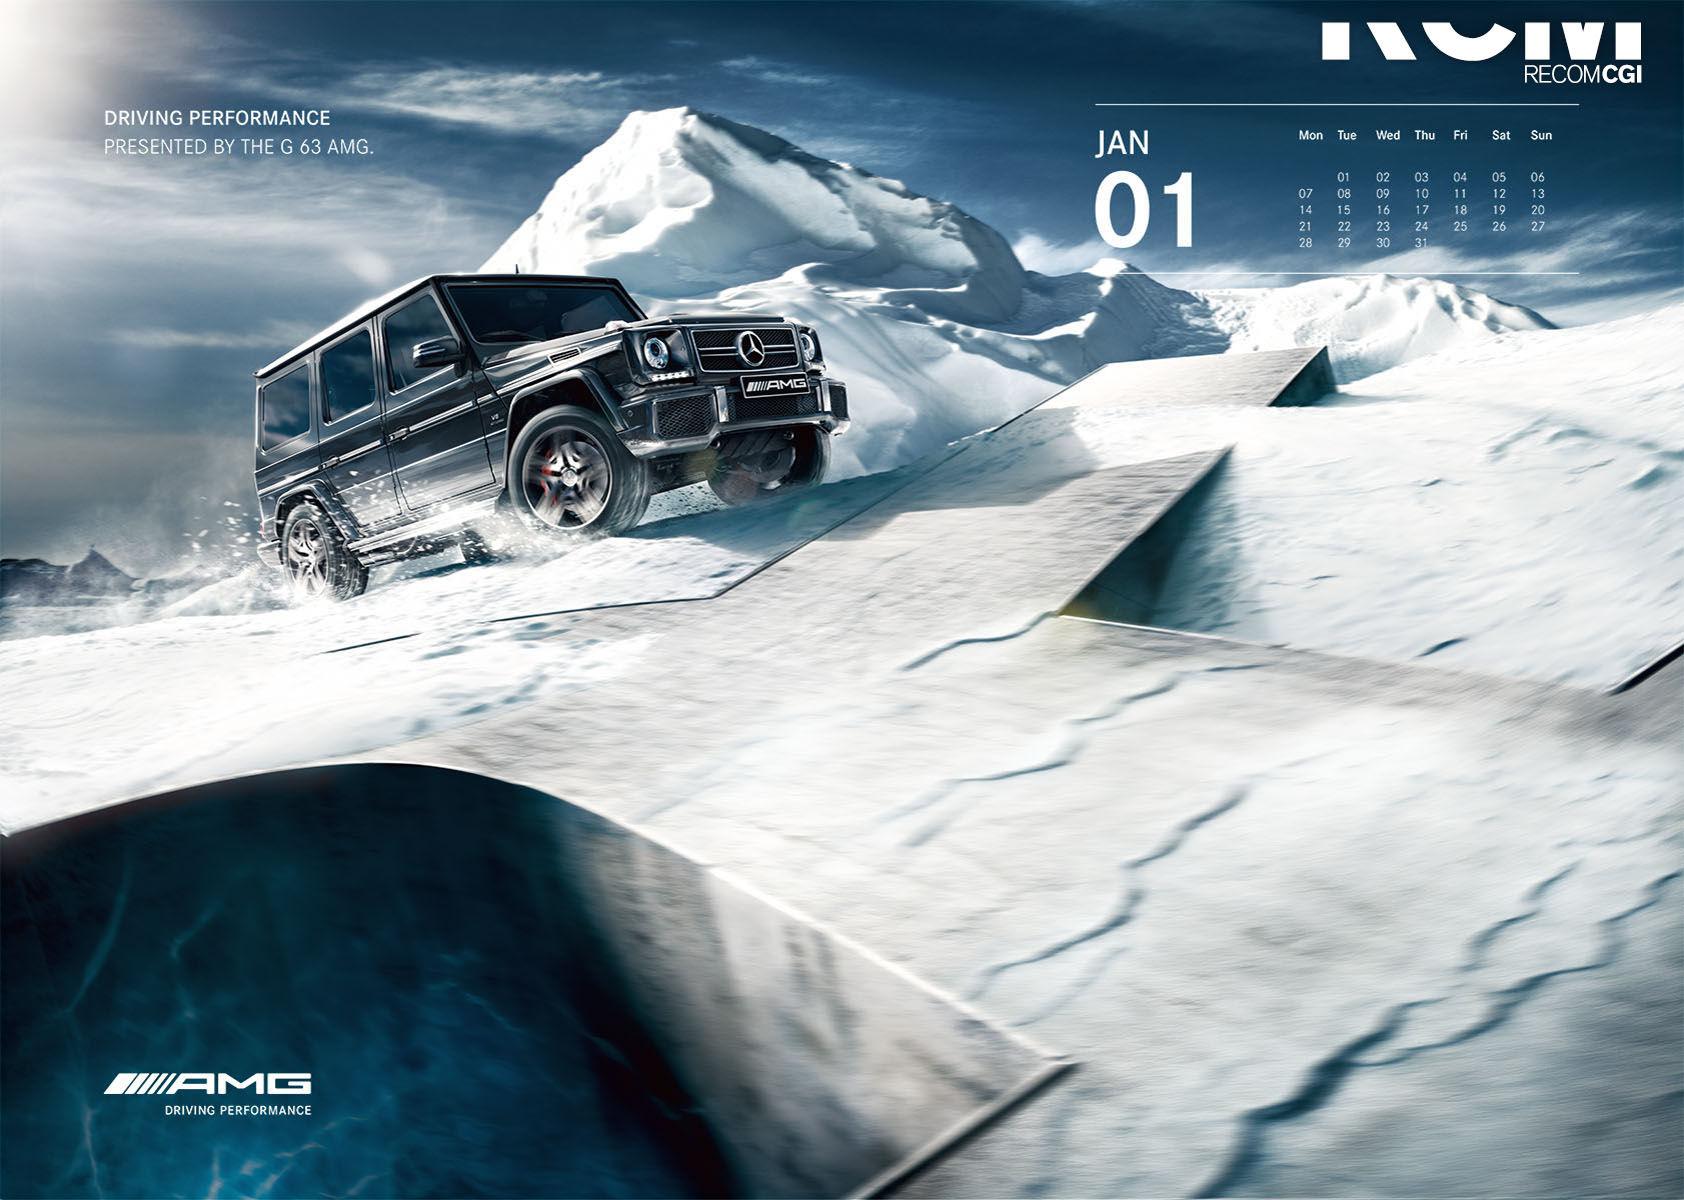 RECOM CGI : AMG-Kalender 2013